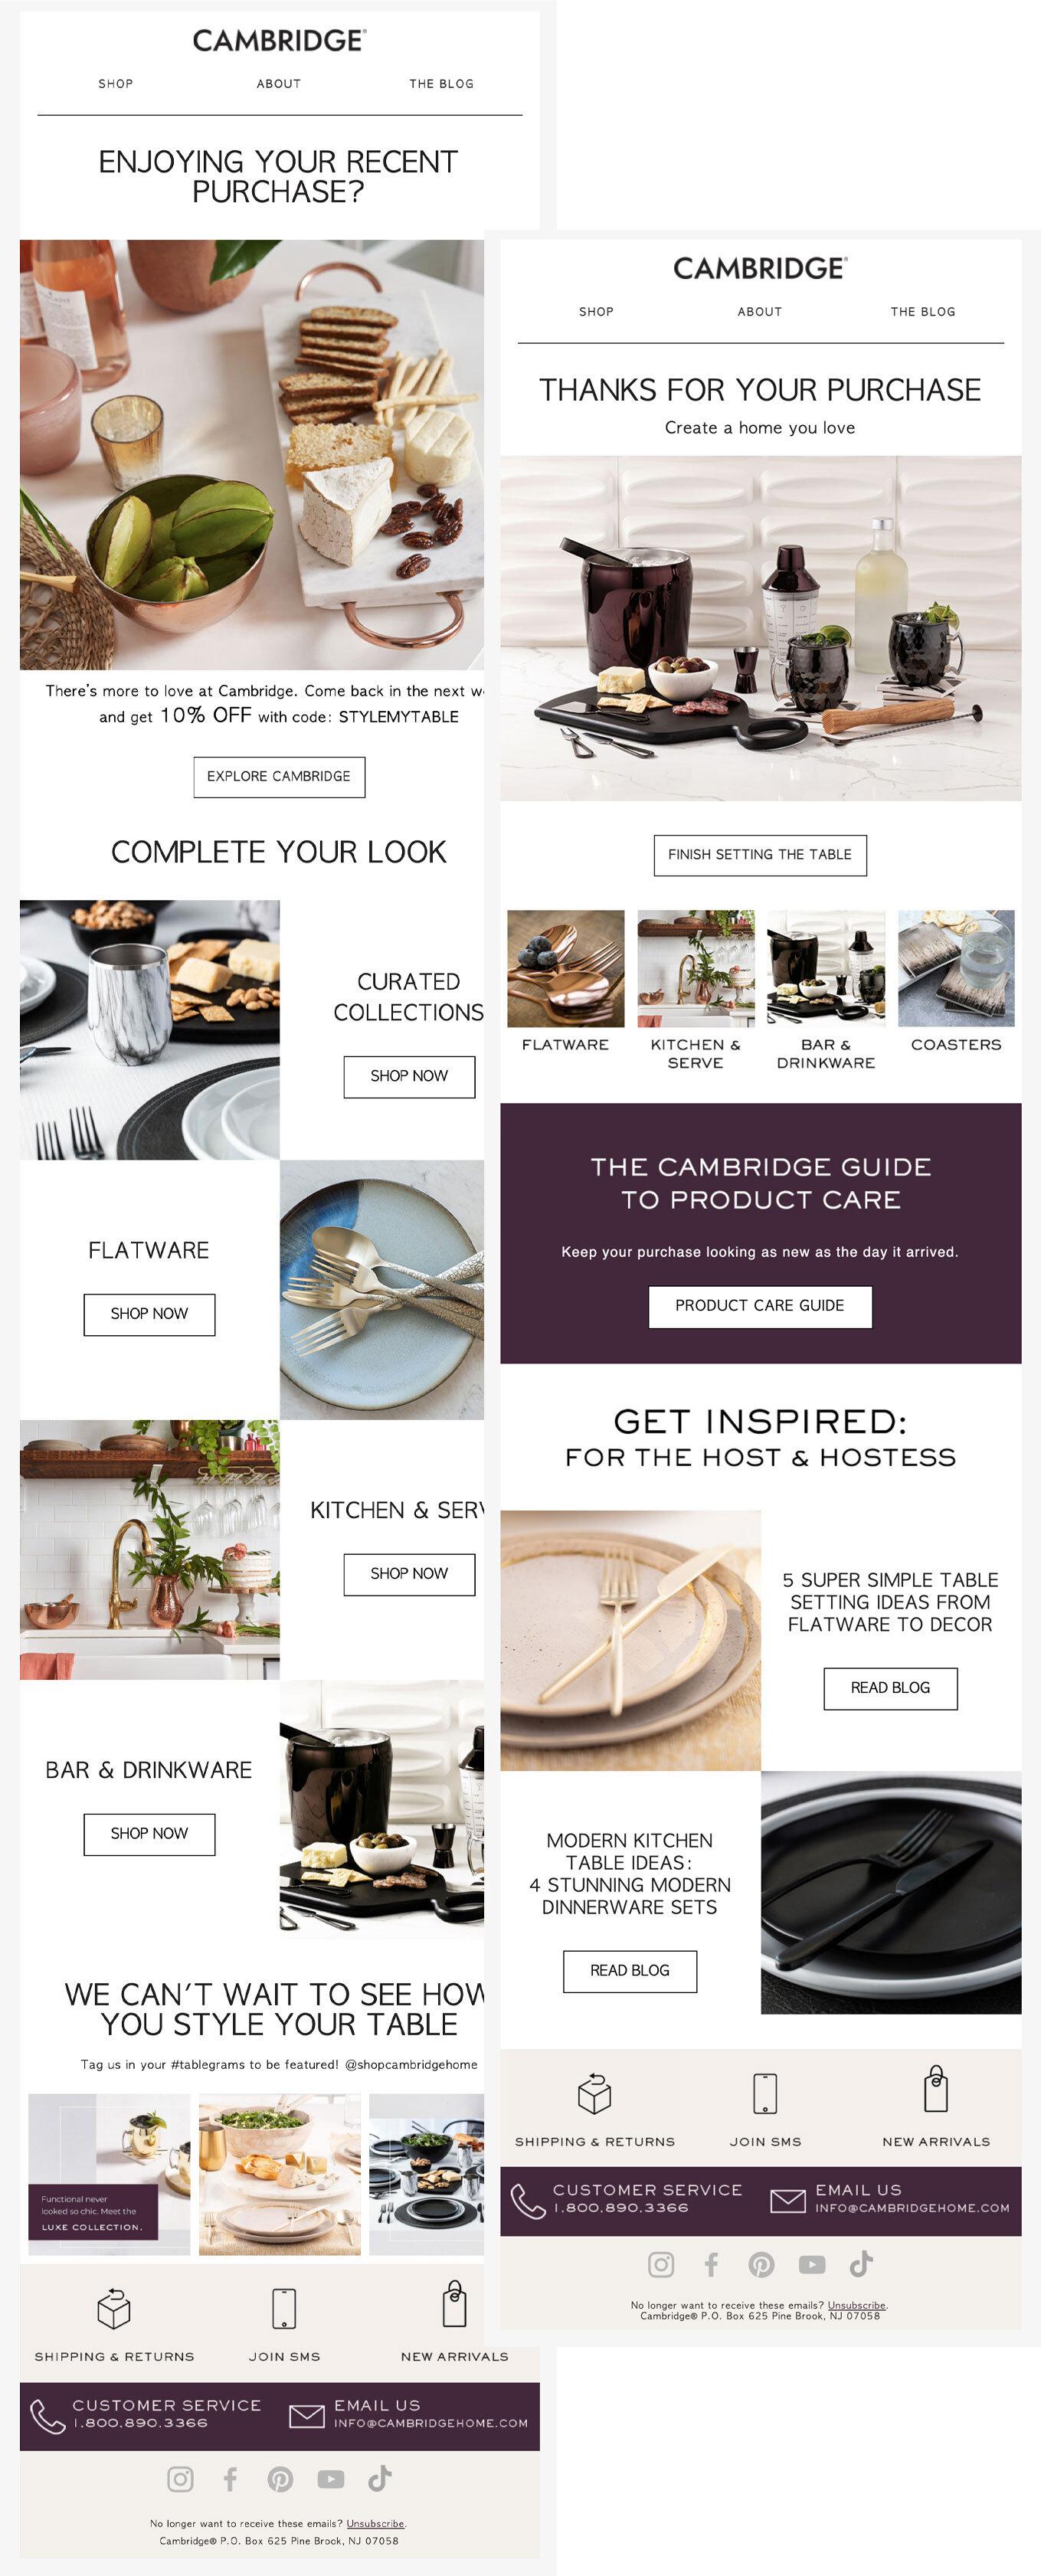 post-purchase-cambridge-1.jpg